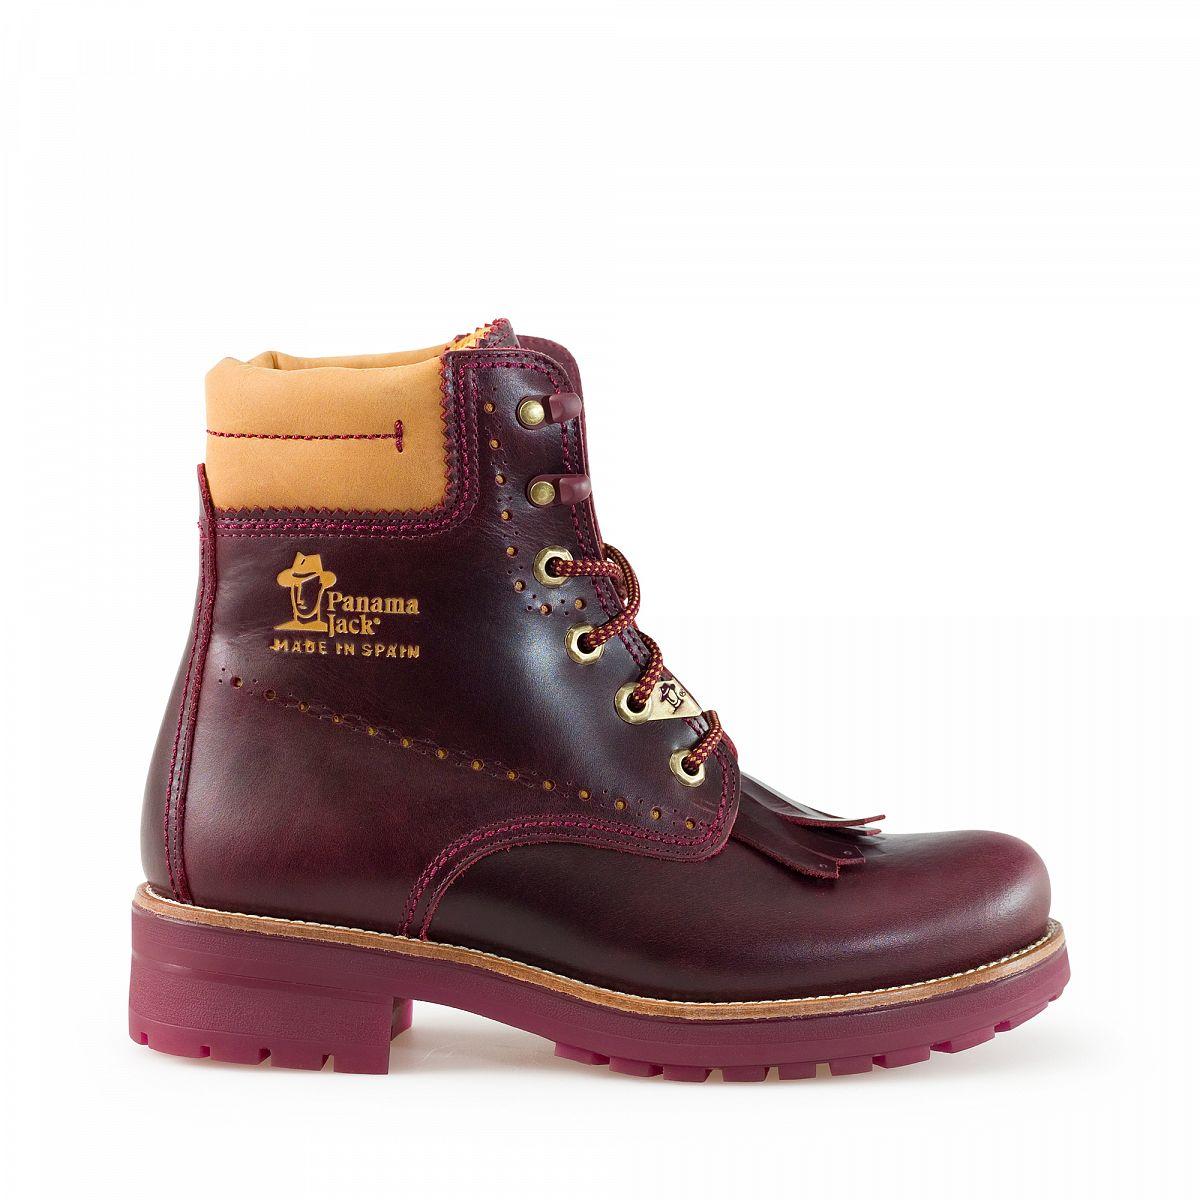 womens boots panama 03 bohemian burgundy panama jack. Black Bedroom Furniture Sets. Home Design Ideas